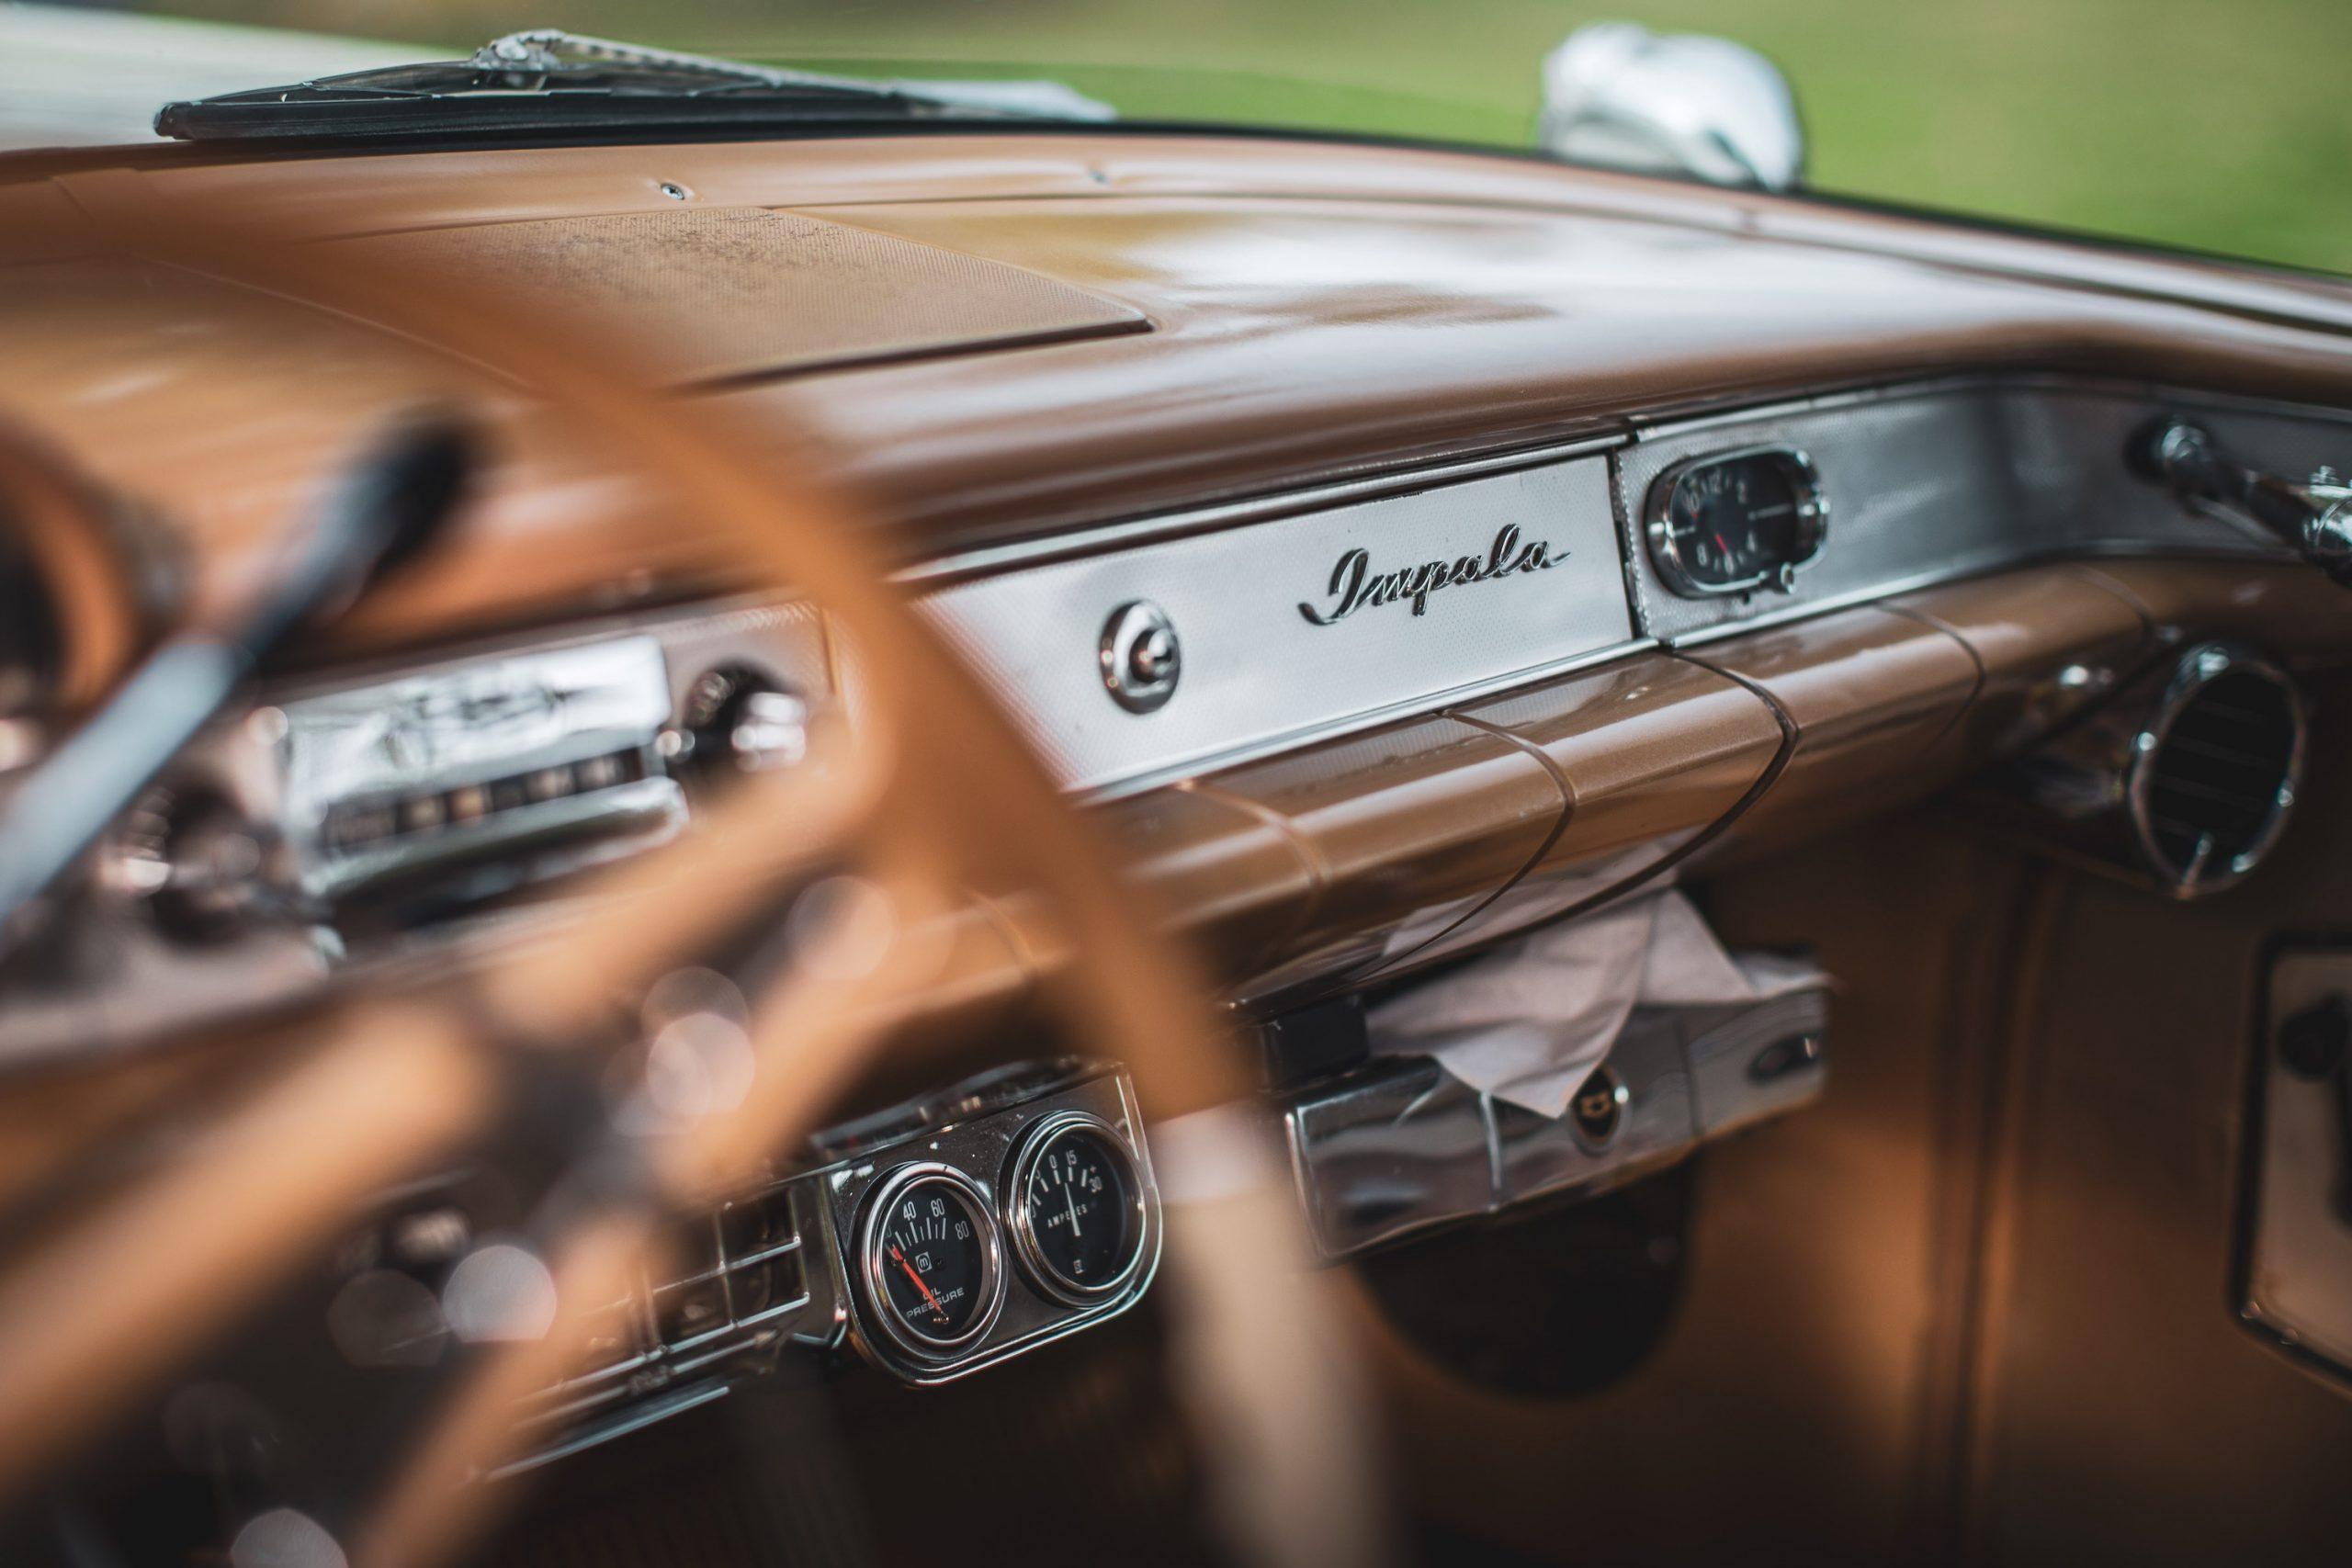 1958 Chevrolet Impala Dash Glove Box